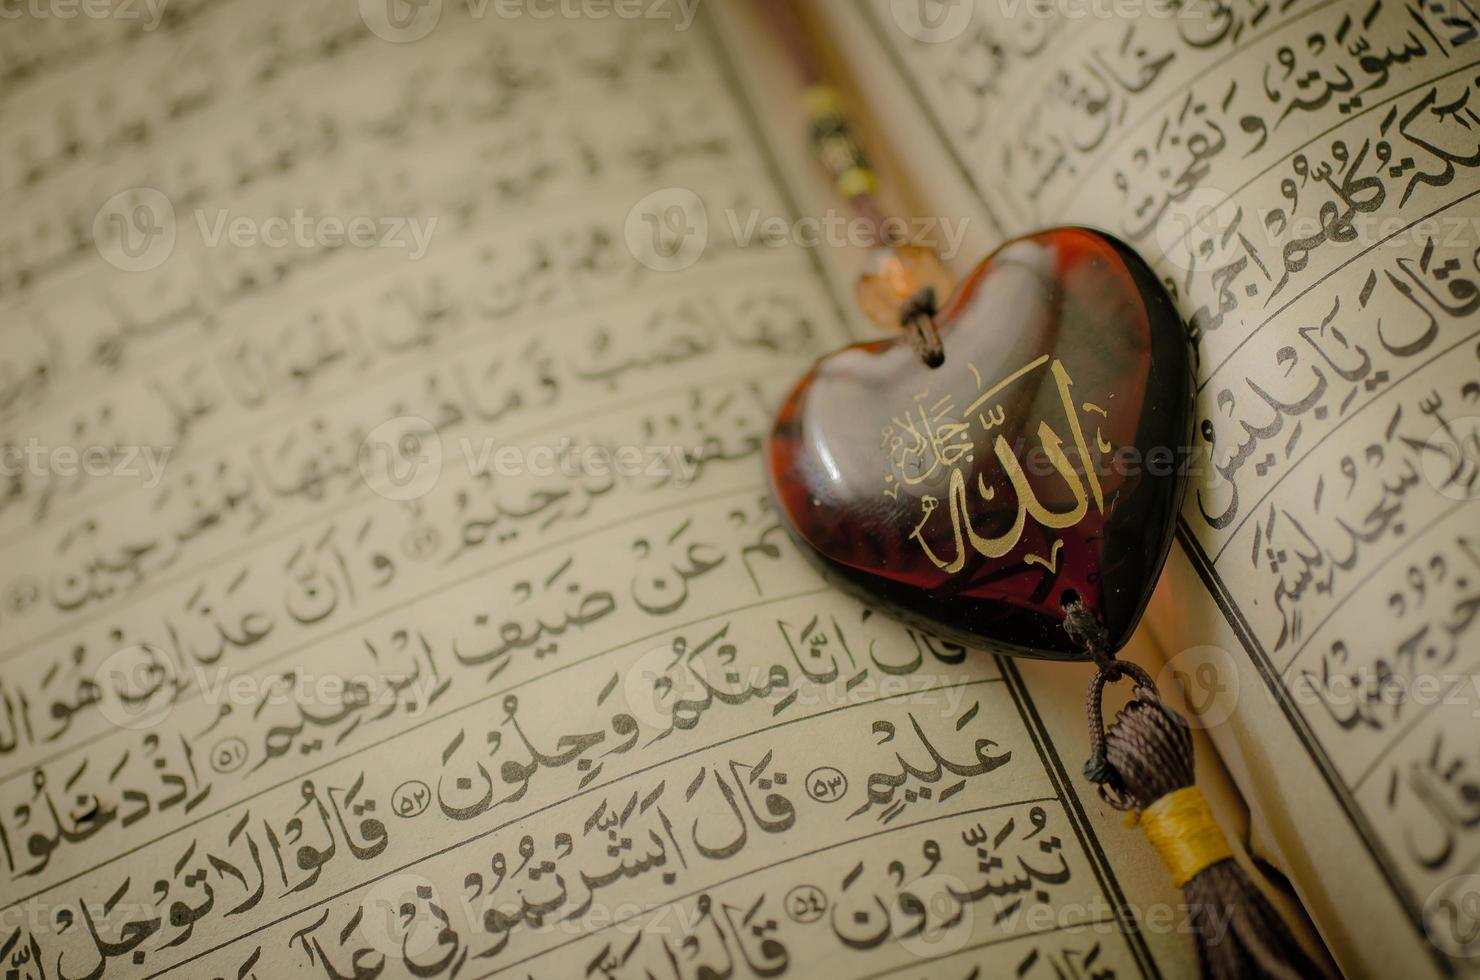 Allah God of Islam foto